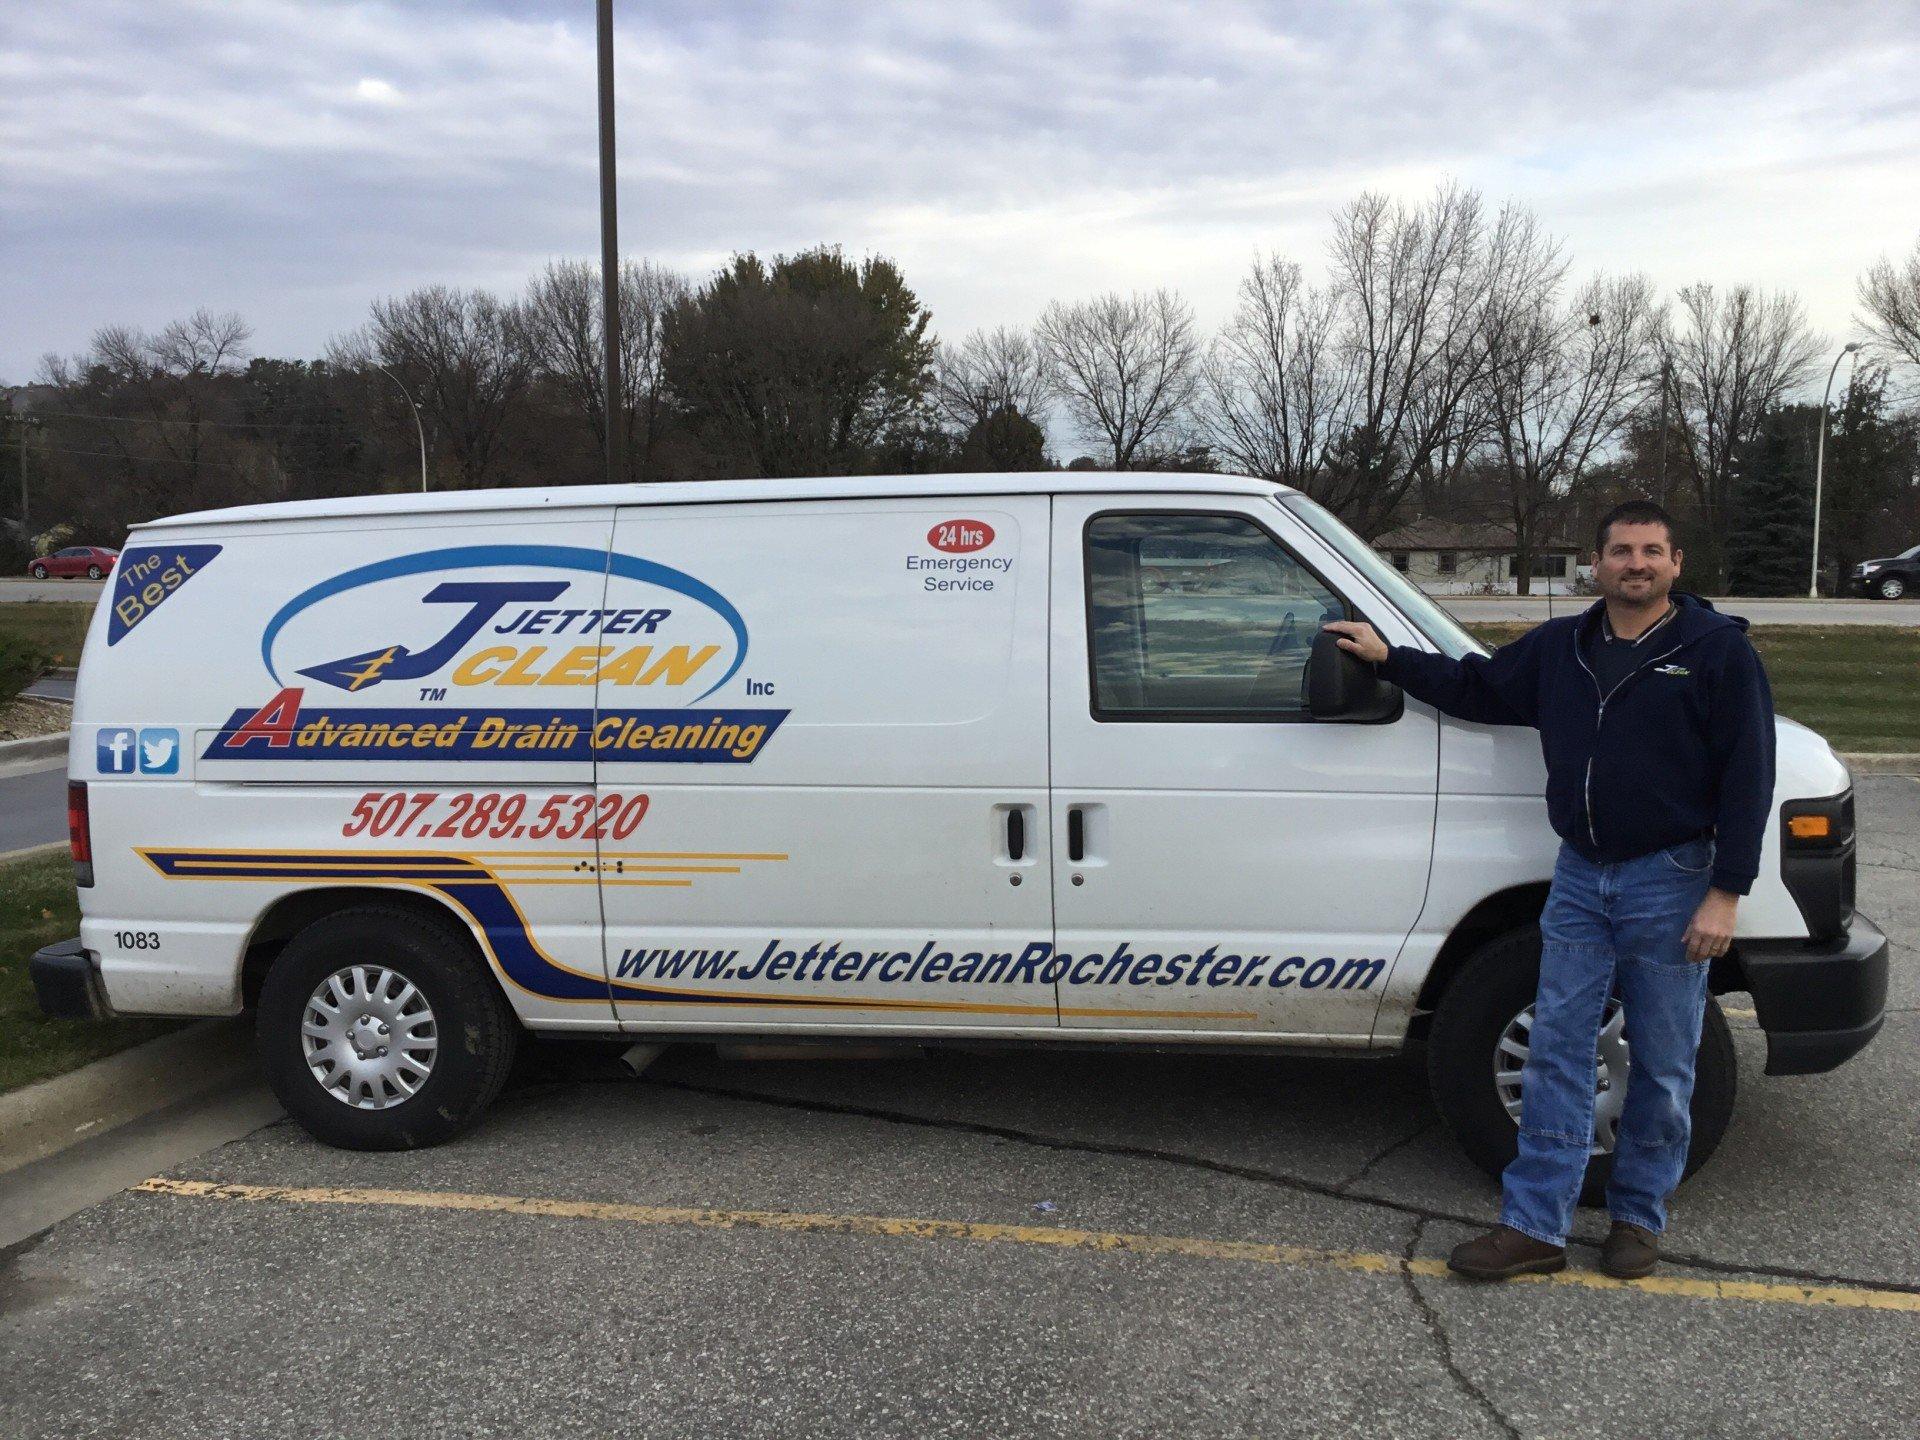 Rochester plumber Jetter Clean Inc.